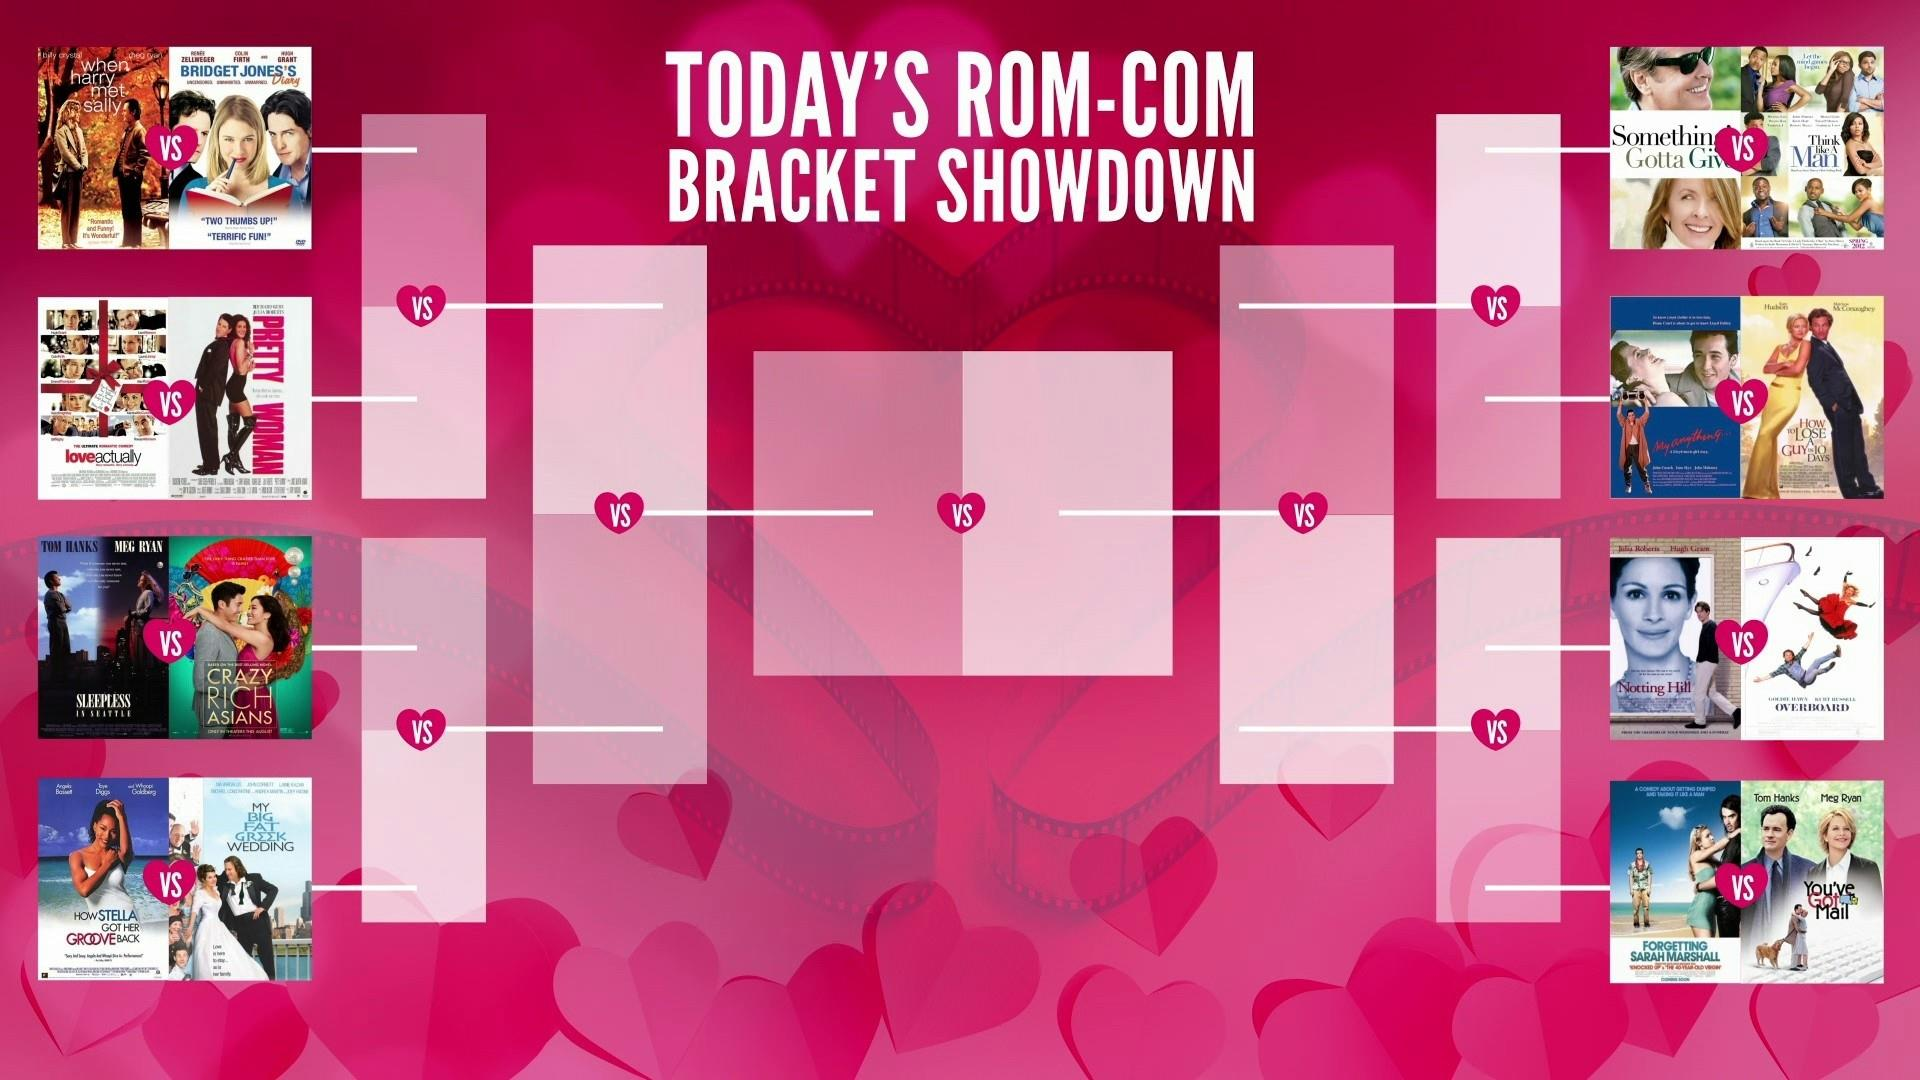 Today S Rom Com Bracket Showdown Vote For Your Favorite